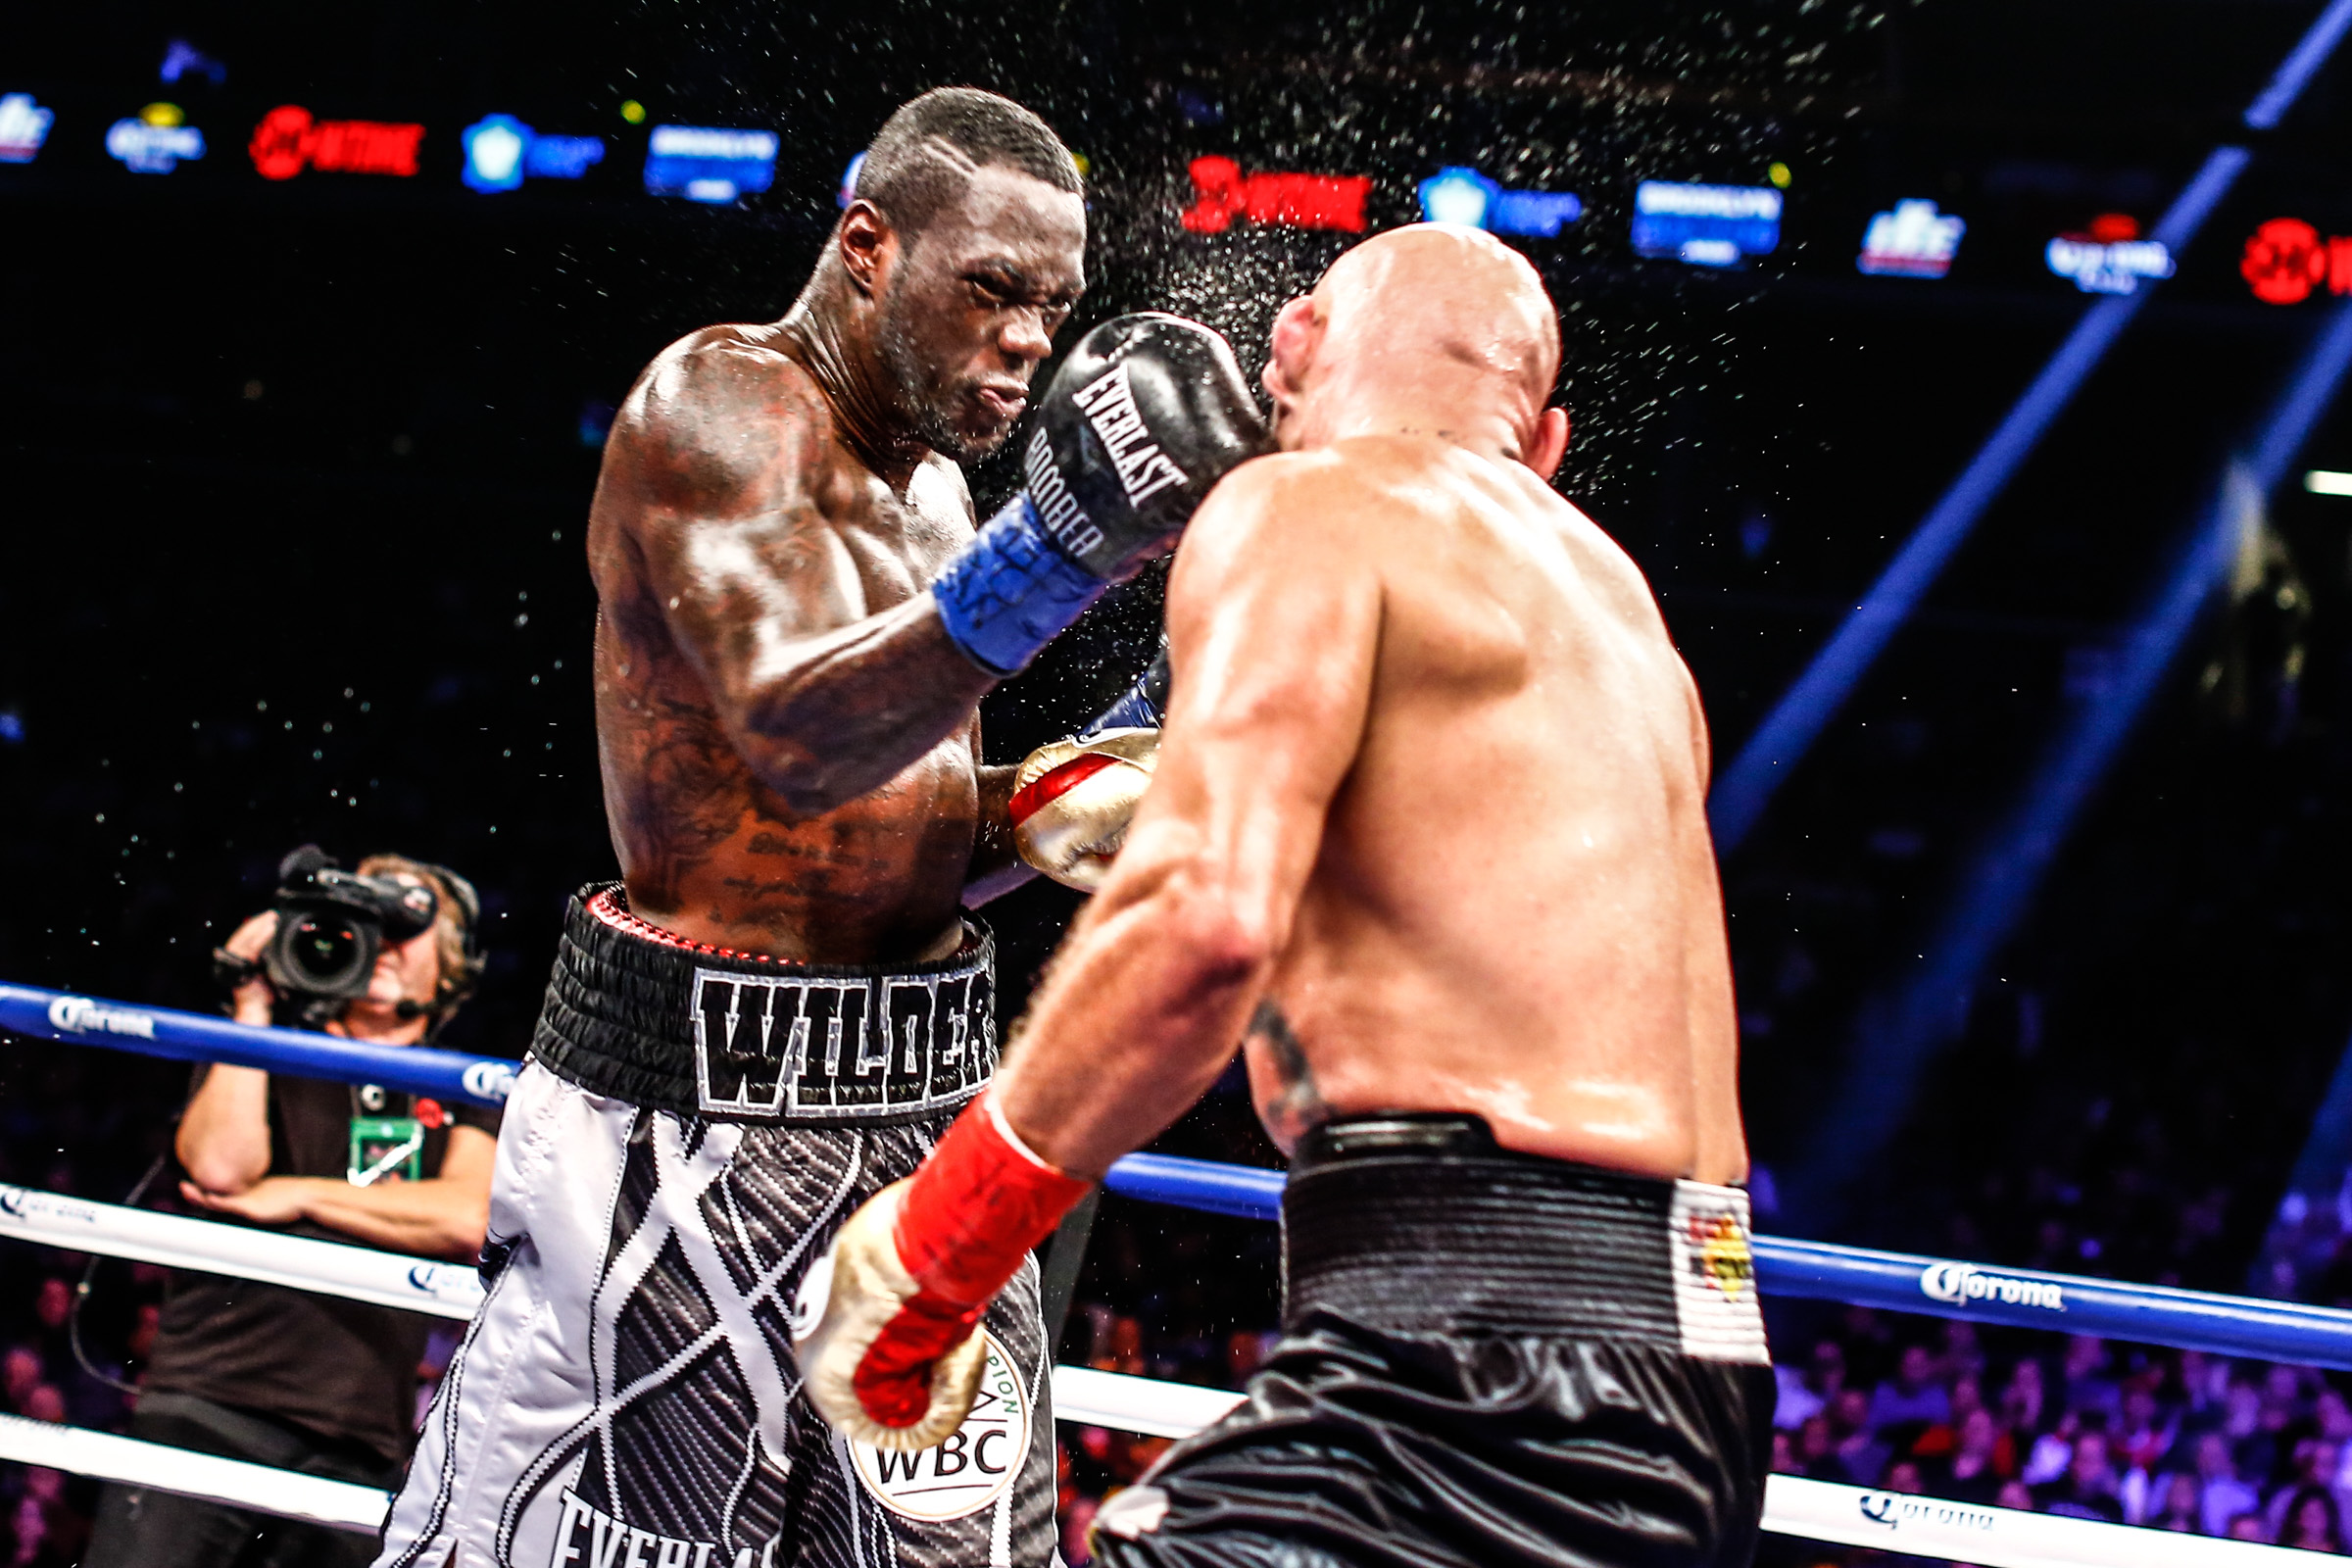 WILDER VS SZPILKA-FIGHT NIGHT-01162016-1021.jpg